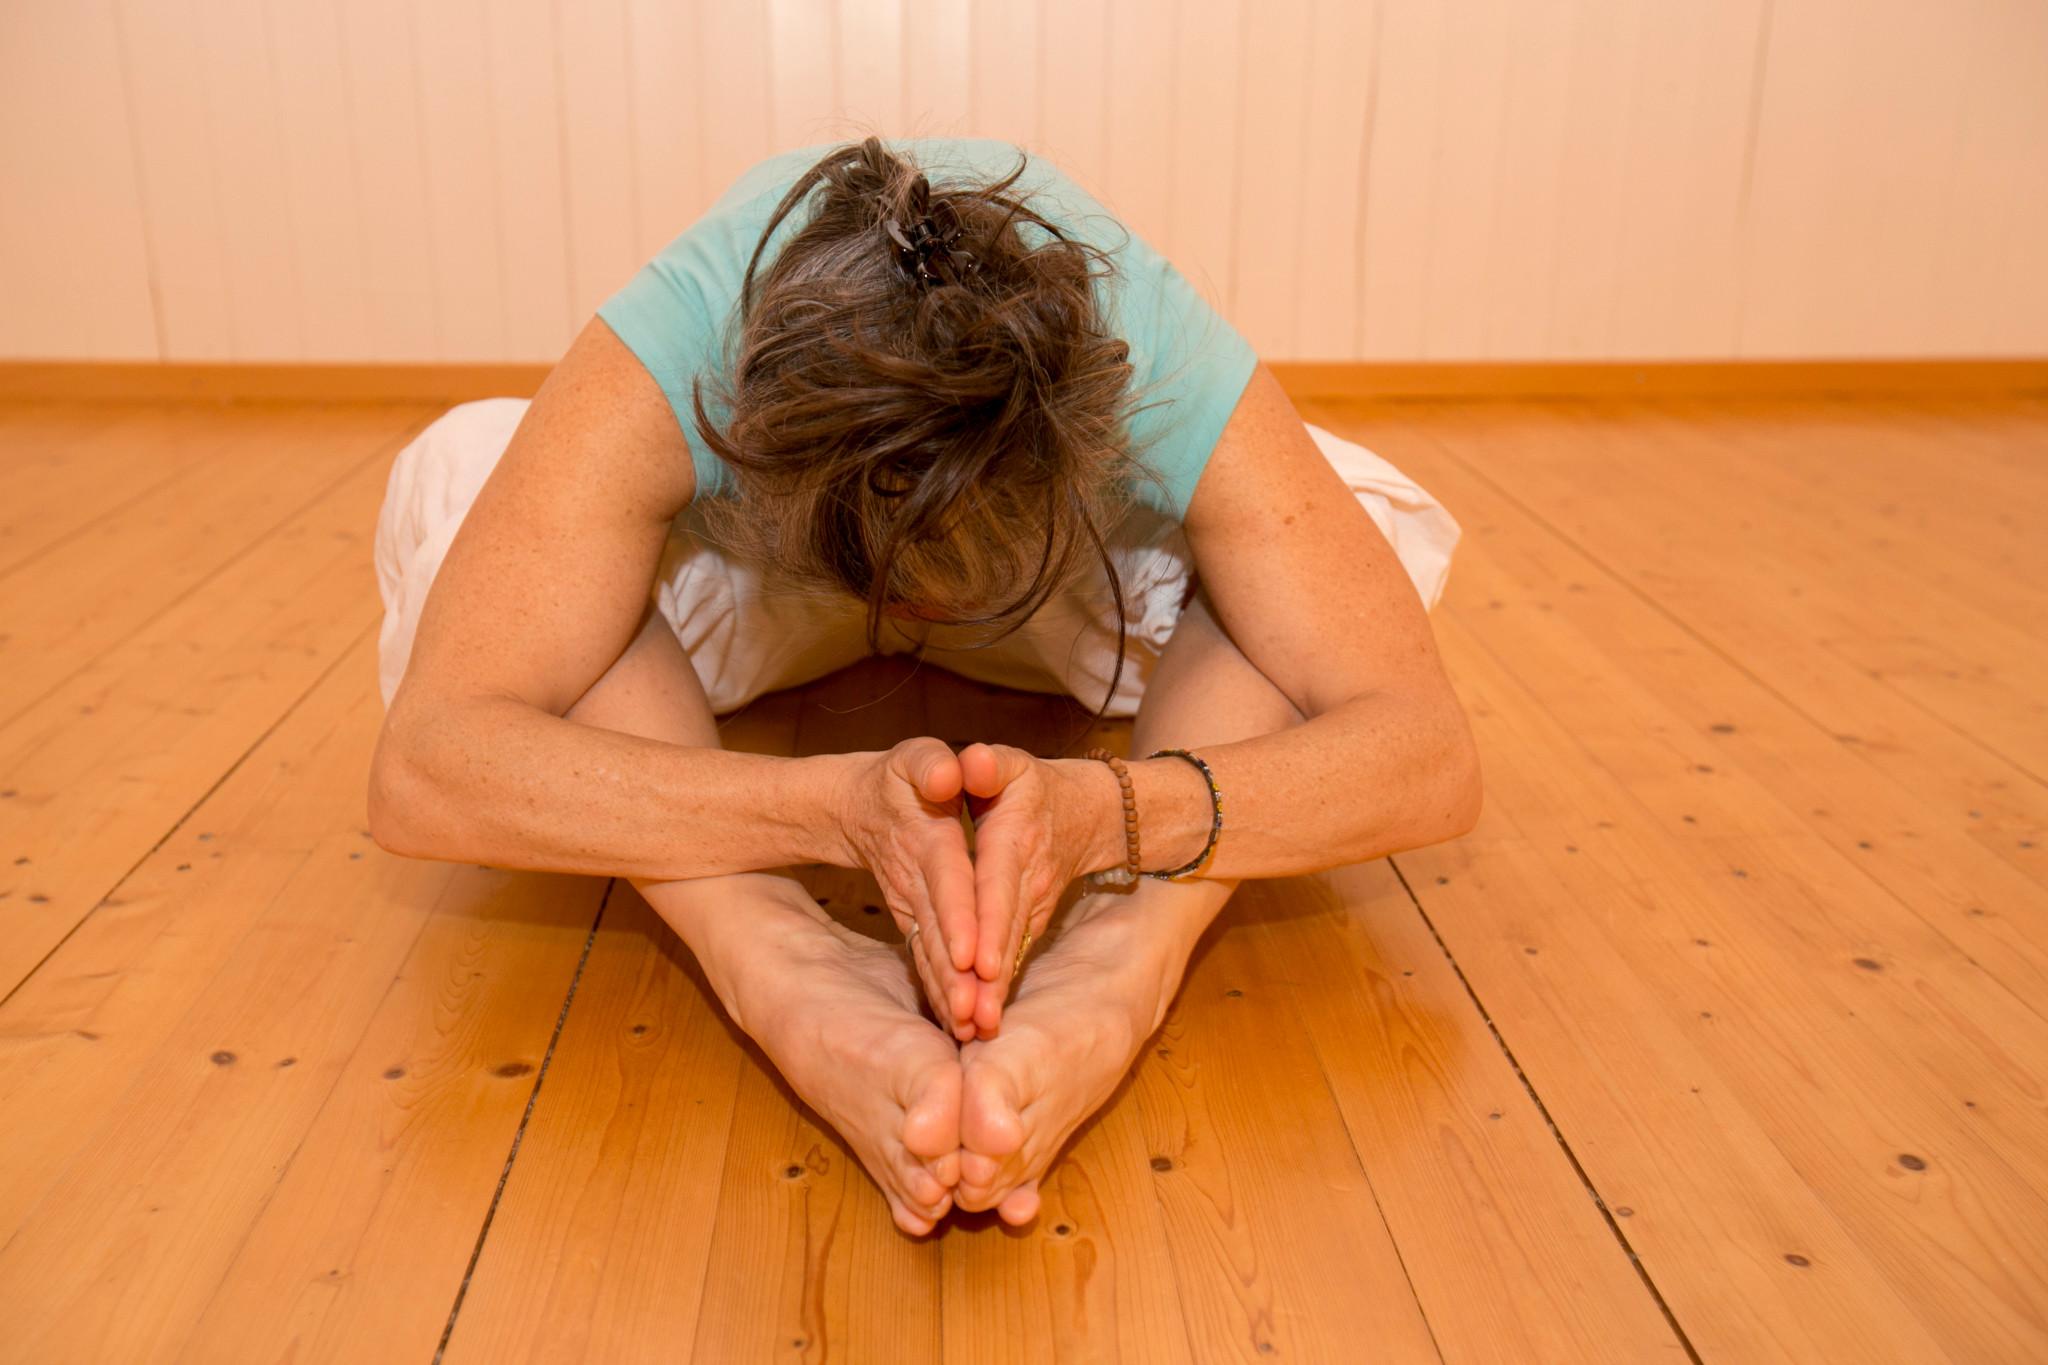 The Art of body-mind holistic coaching